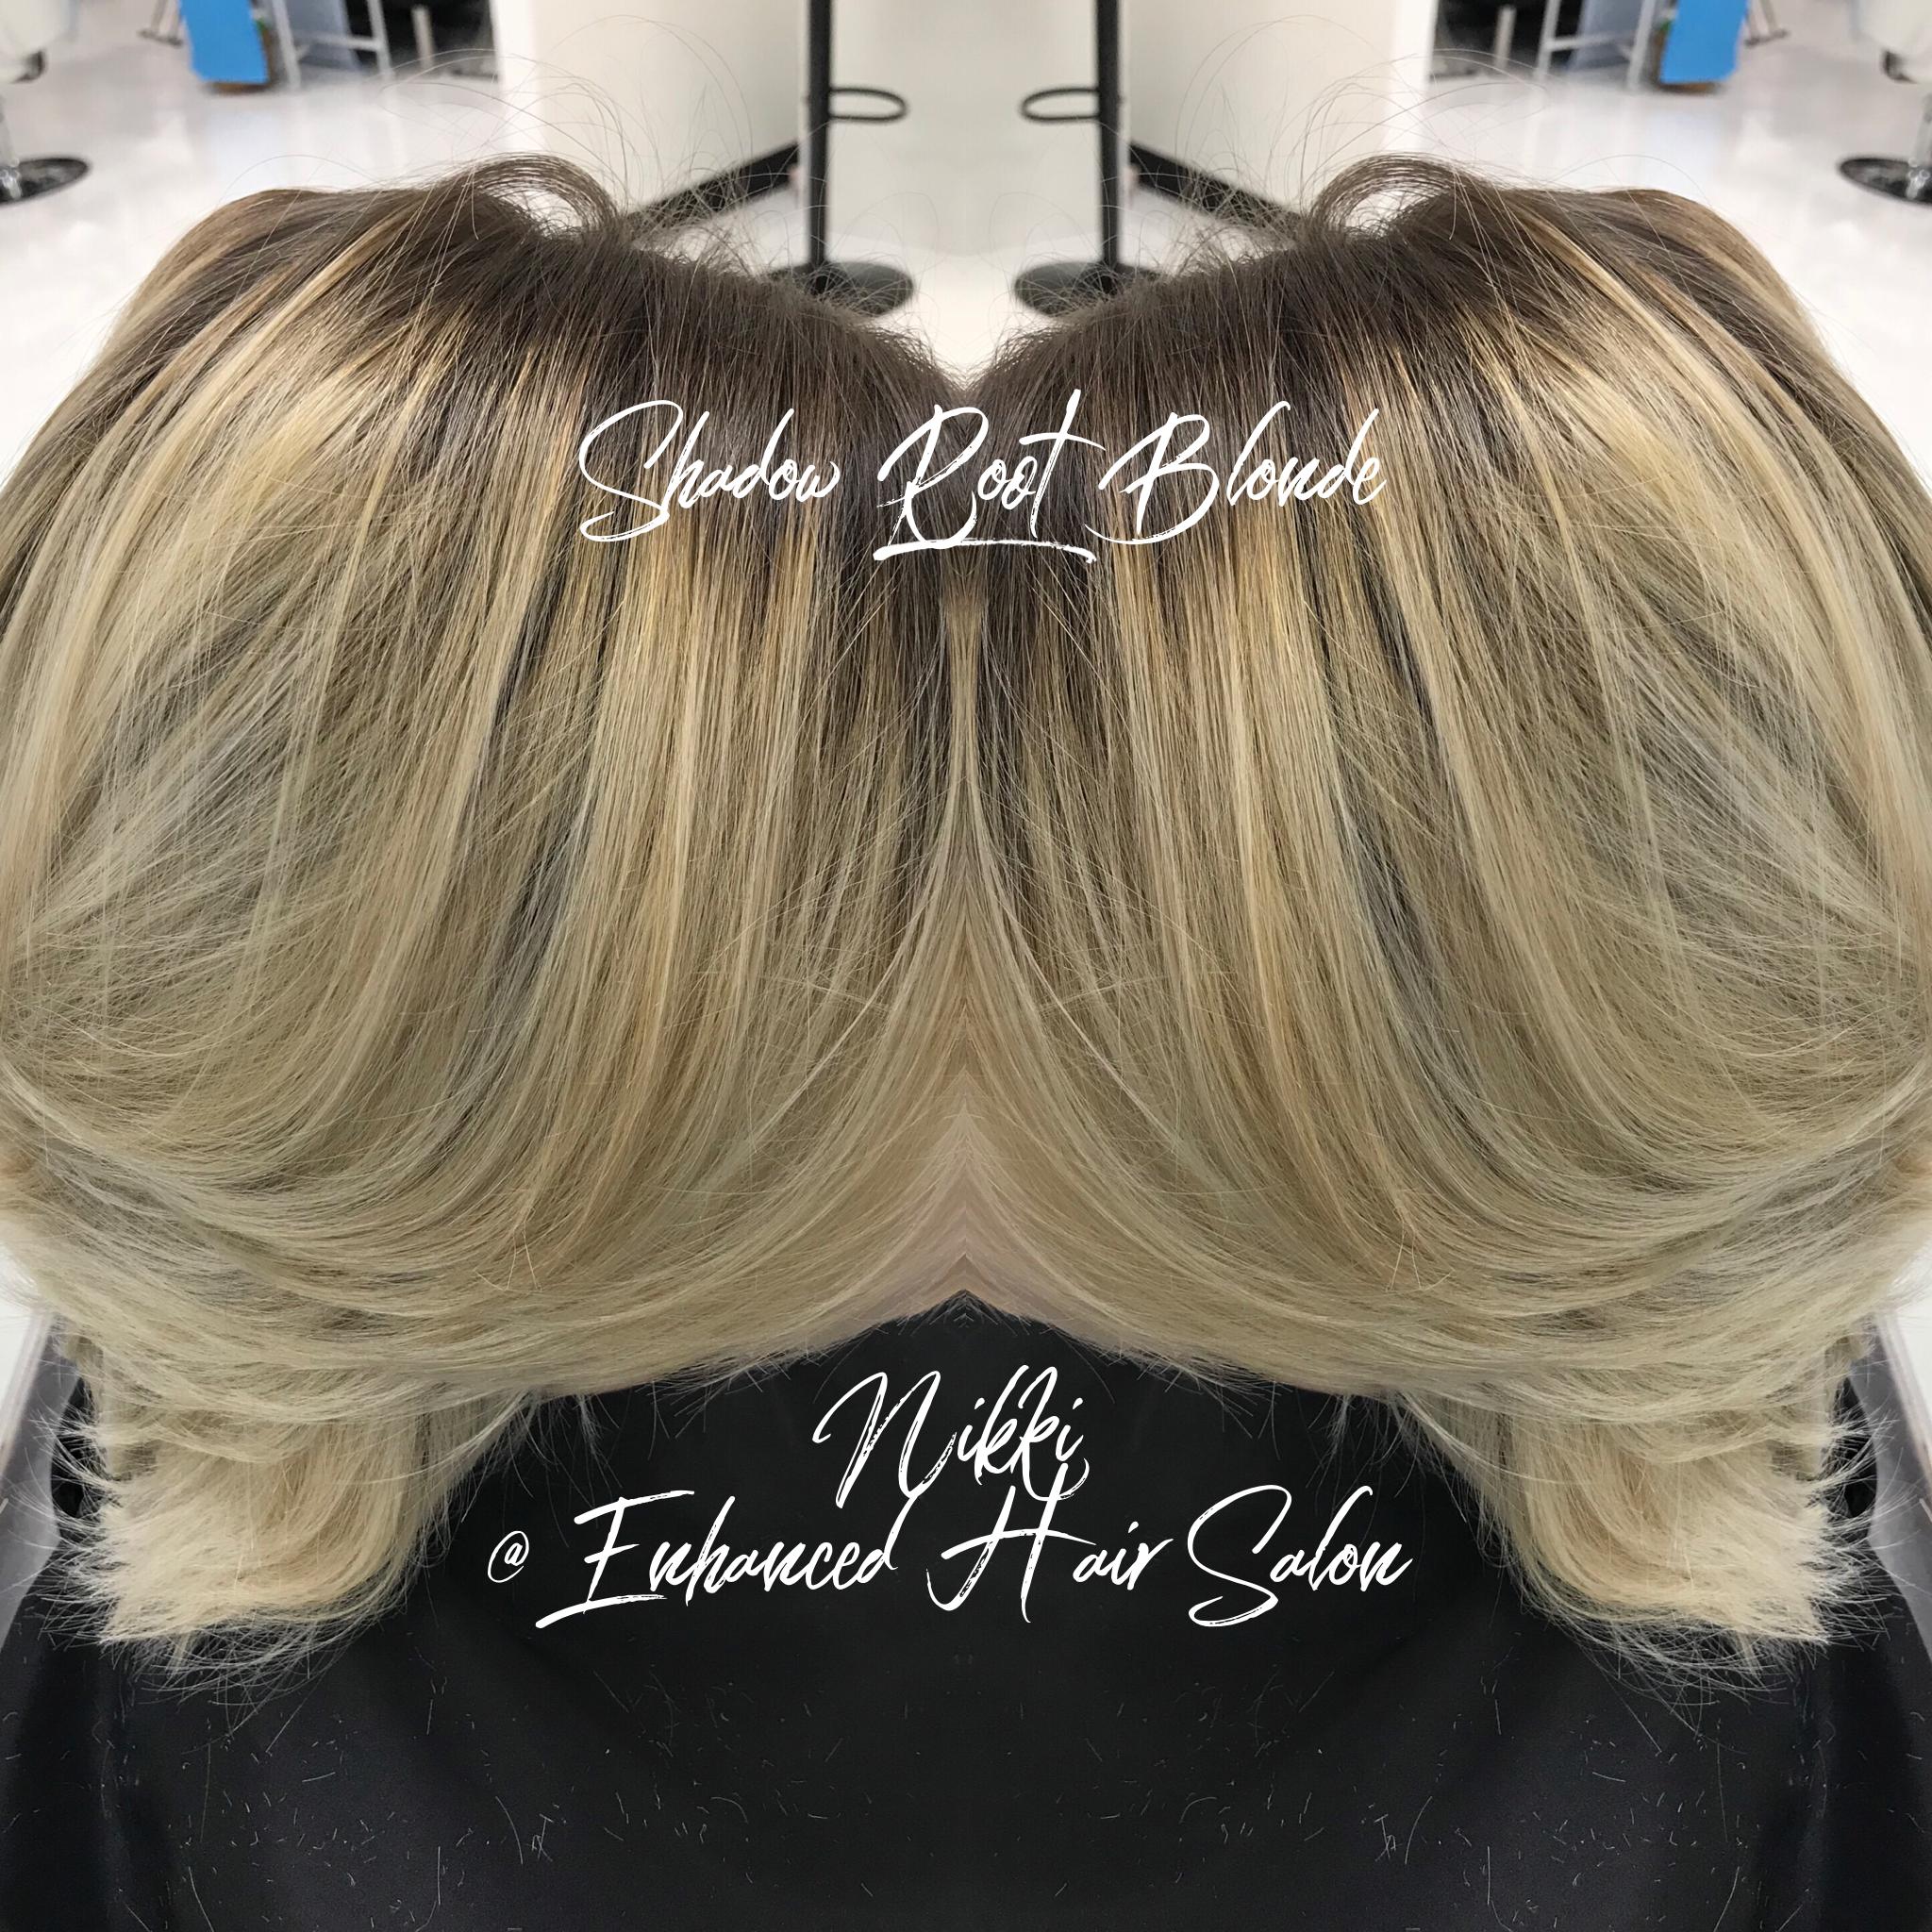 Pin by suzi on enhanced hair salon pinterest